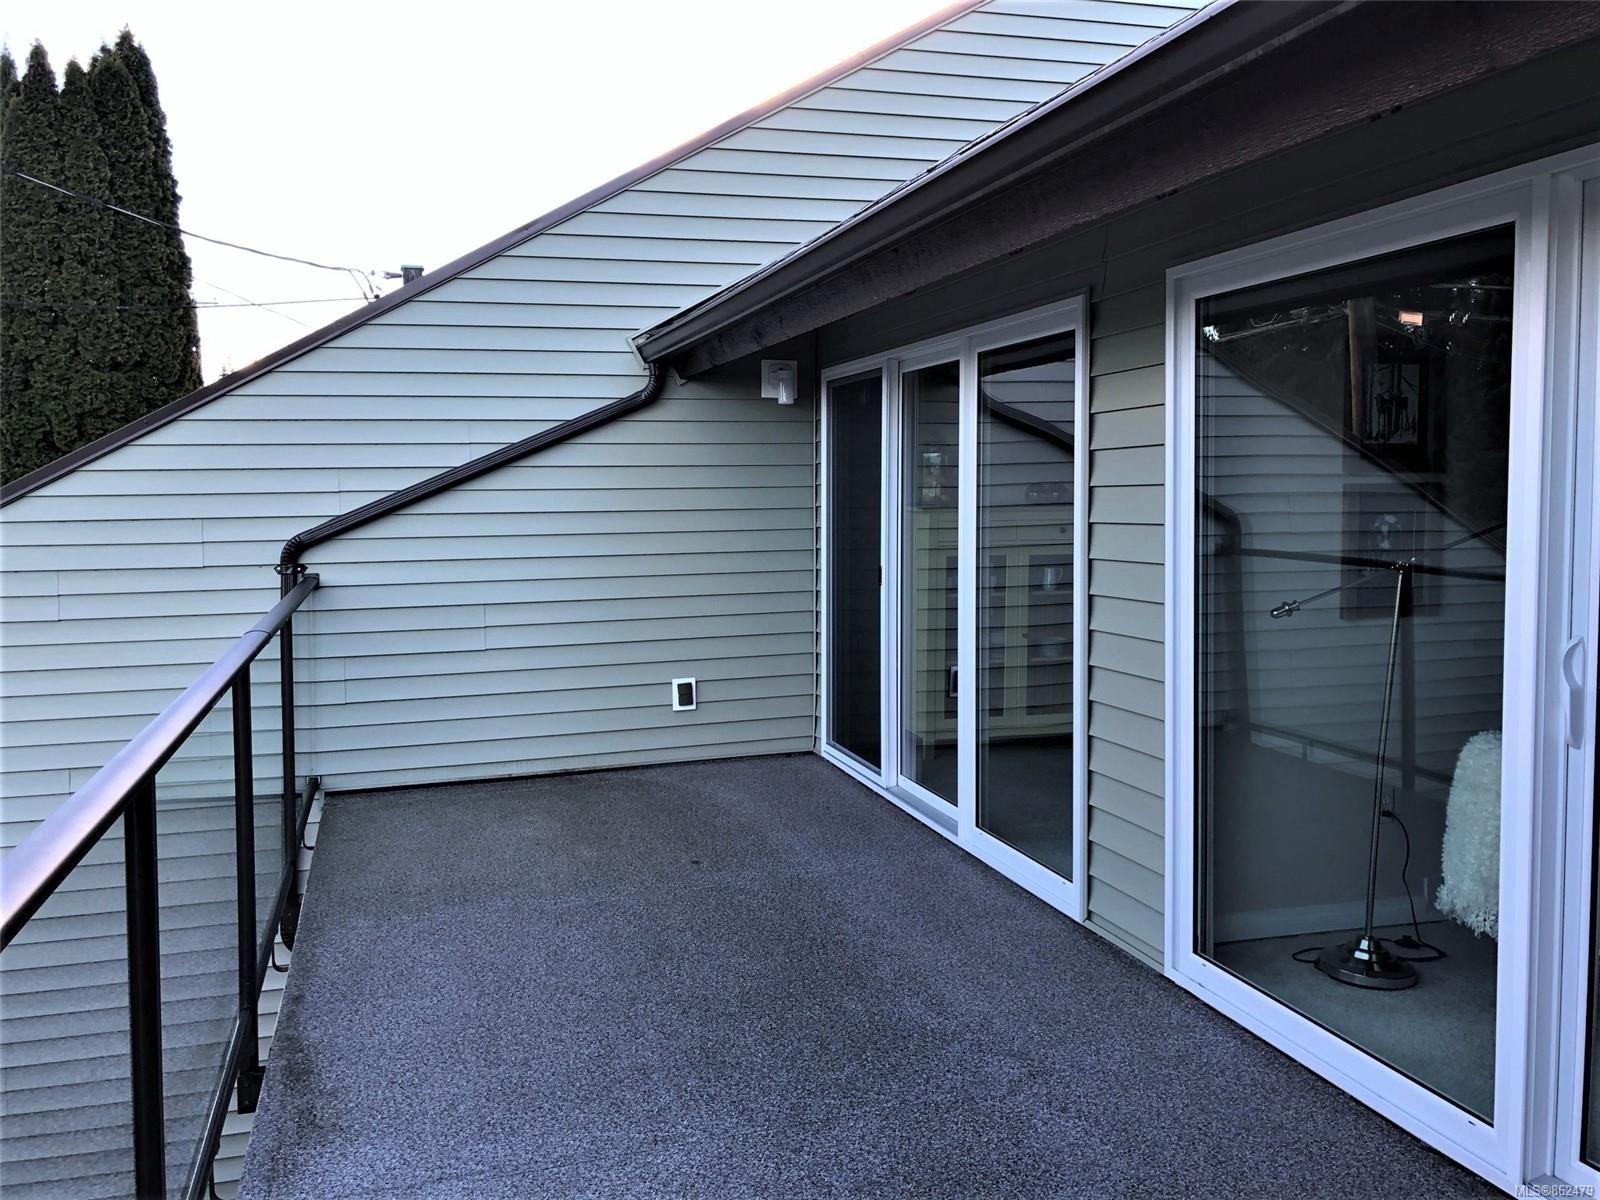 Photo 37: Photos: 6 570 W CRESCENT Rd in : PQ Qualicum Beach Row/Townhouse for sale (Parksville/Qualicum)  : MLS®# 862479